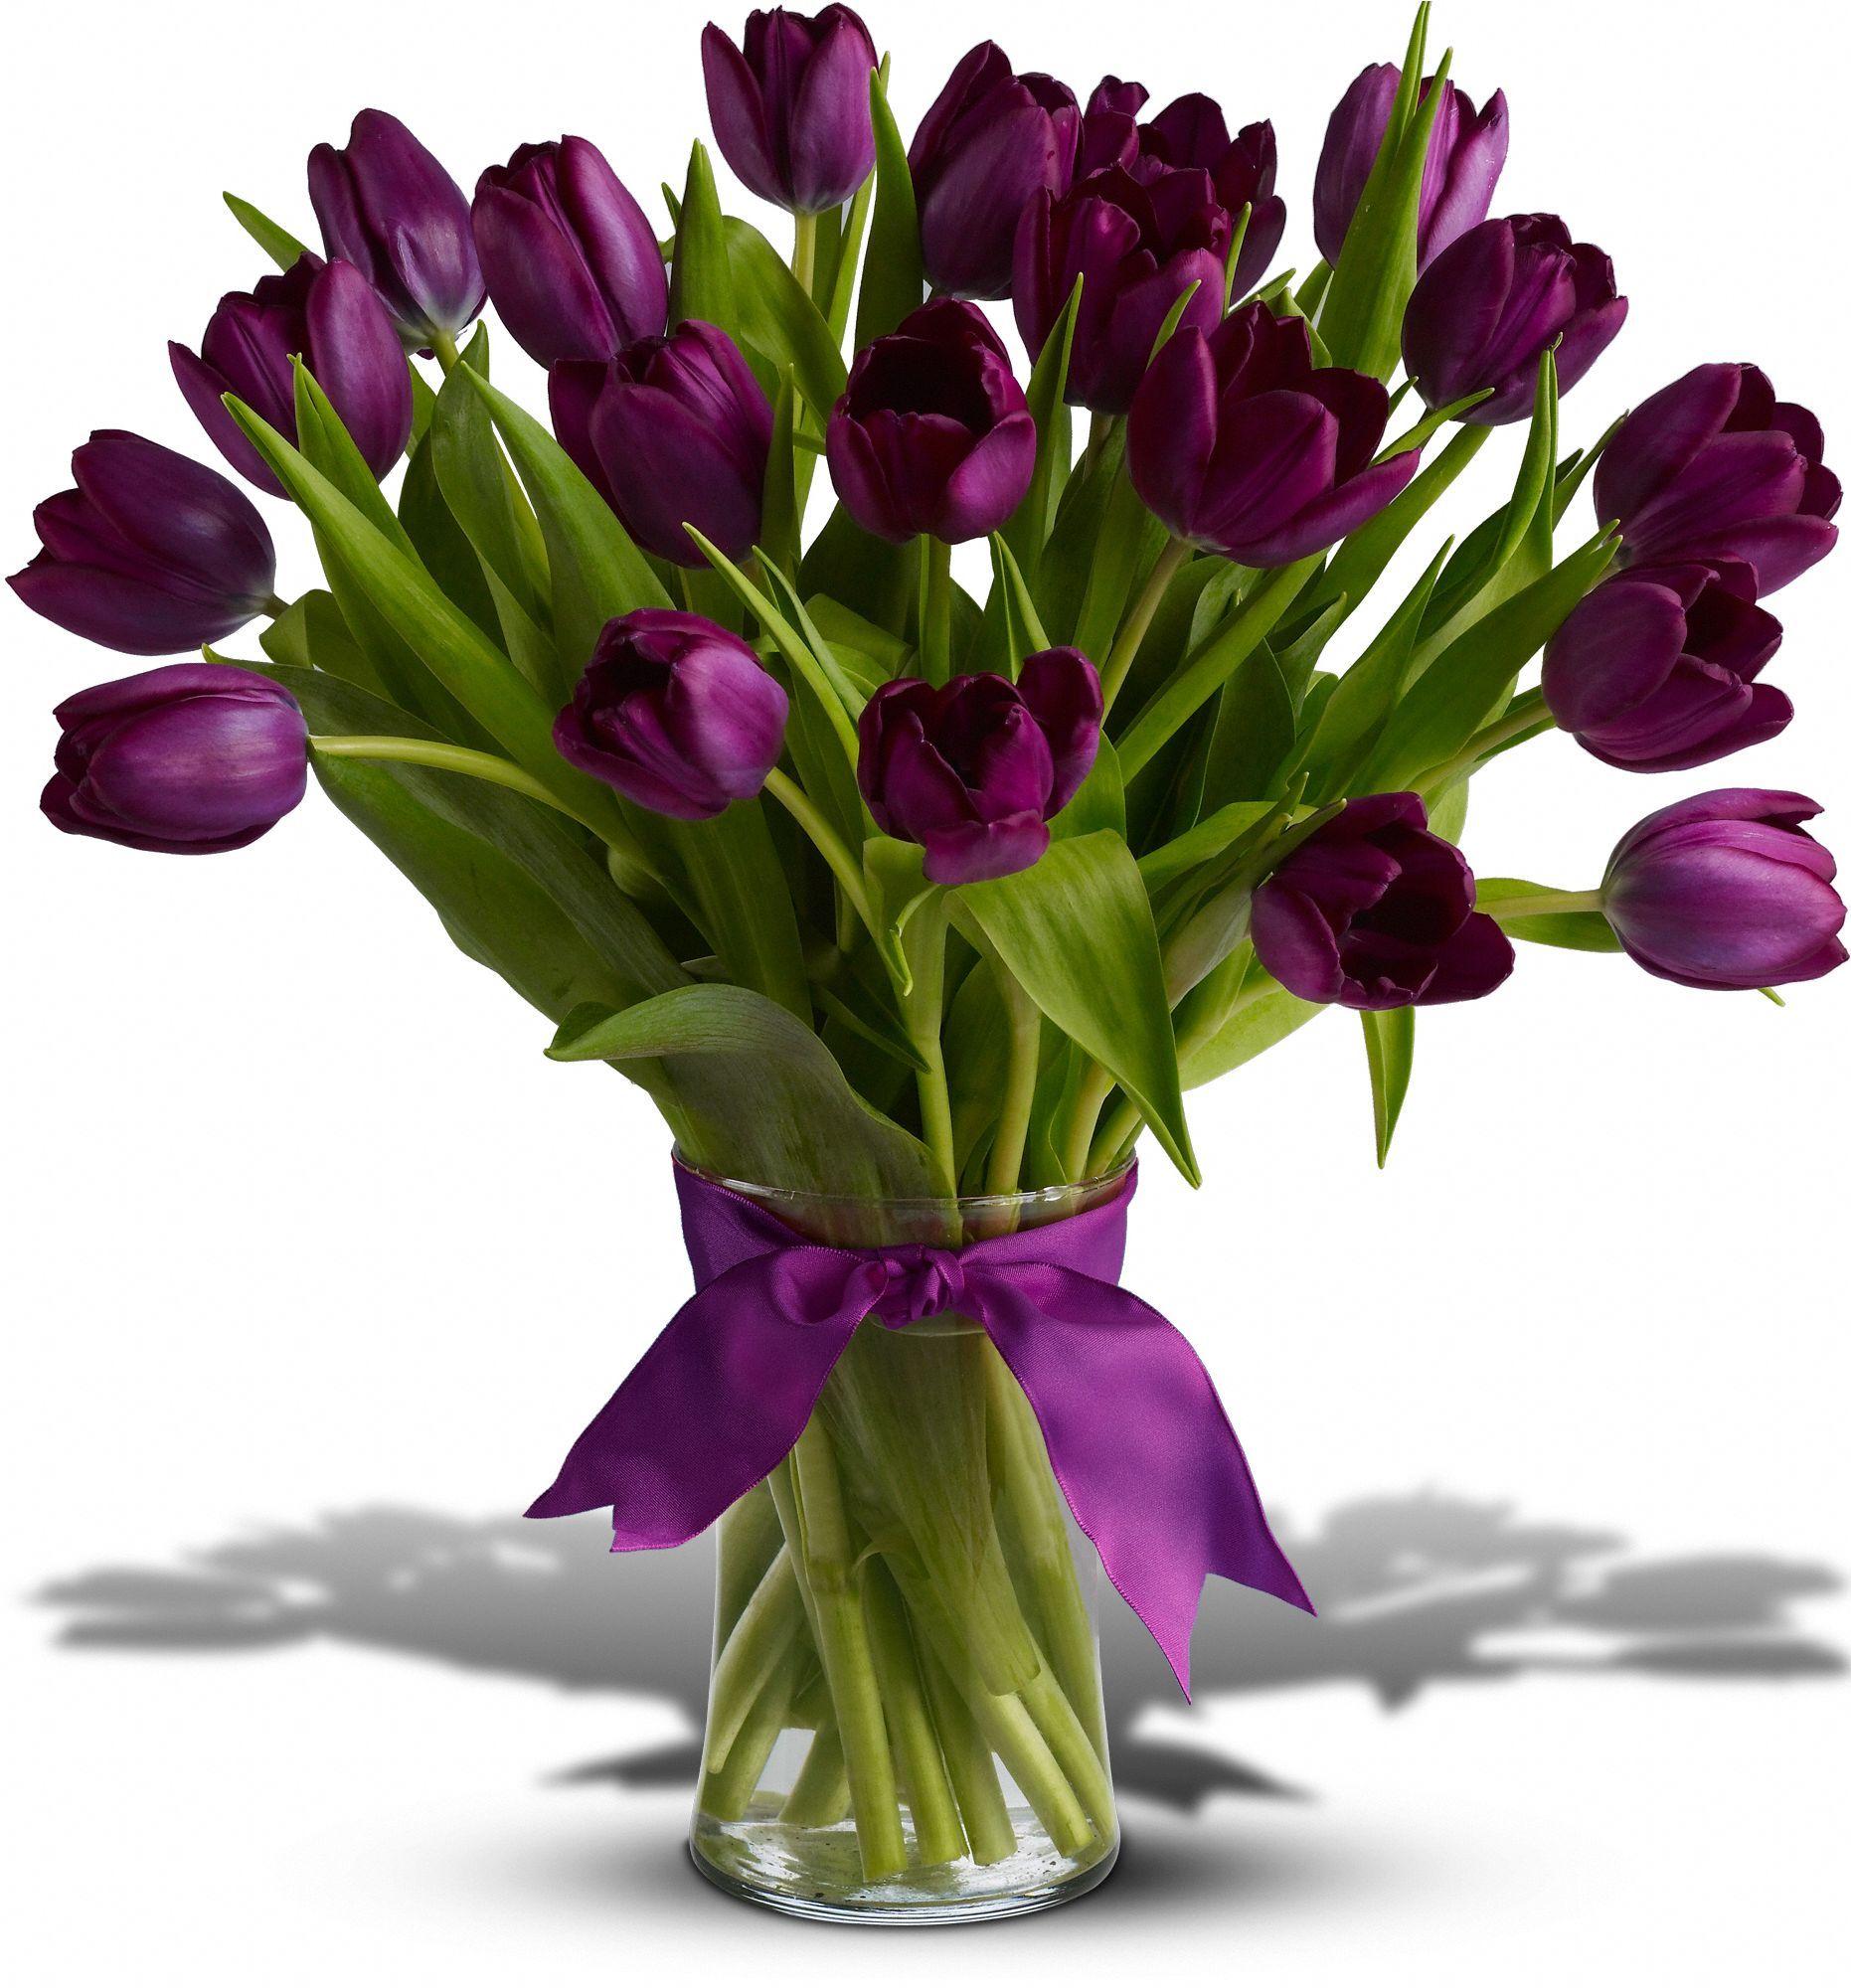 Pin By Sandy Smothers Newey On Color Me Purple Tulips Arrangement Flower Arrangements Tulips Flowers